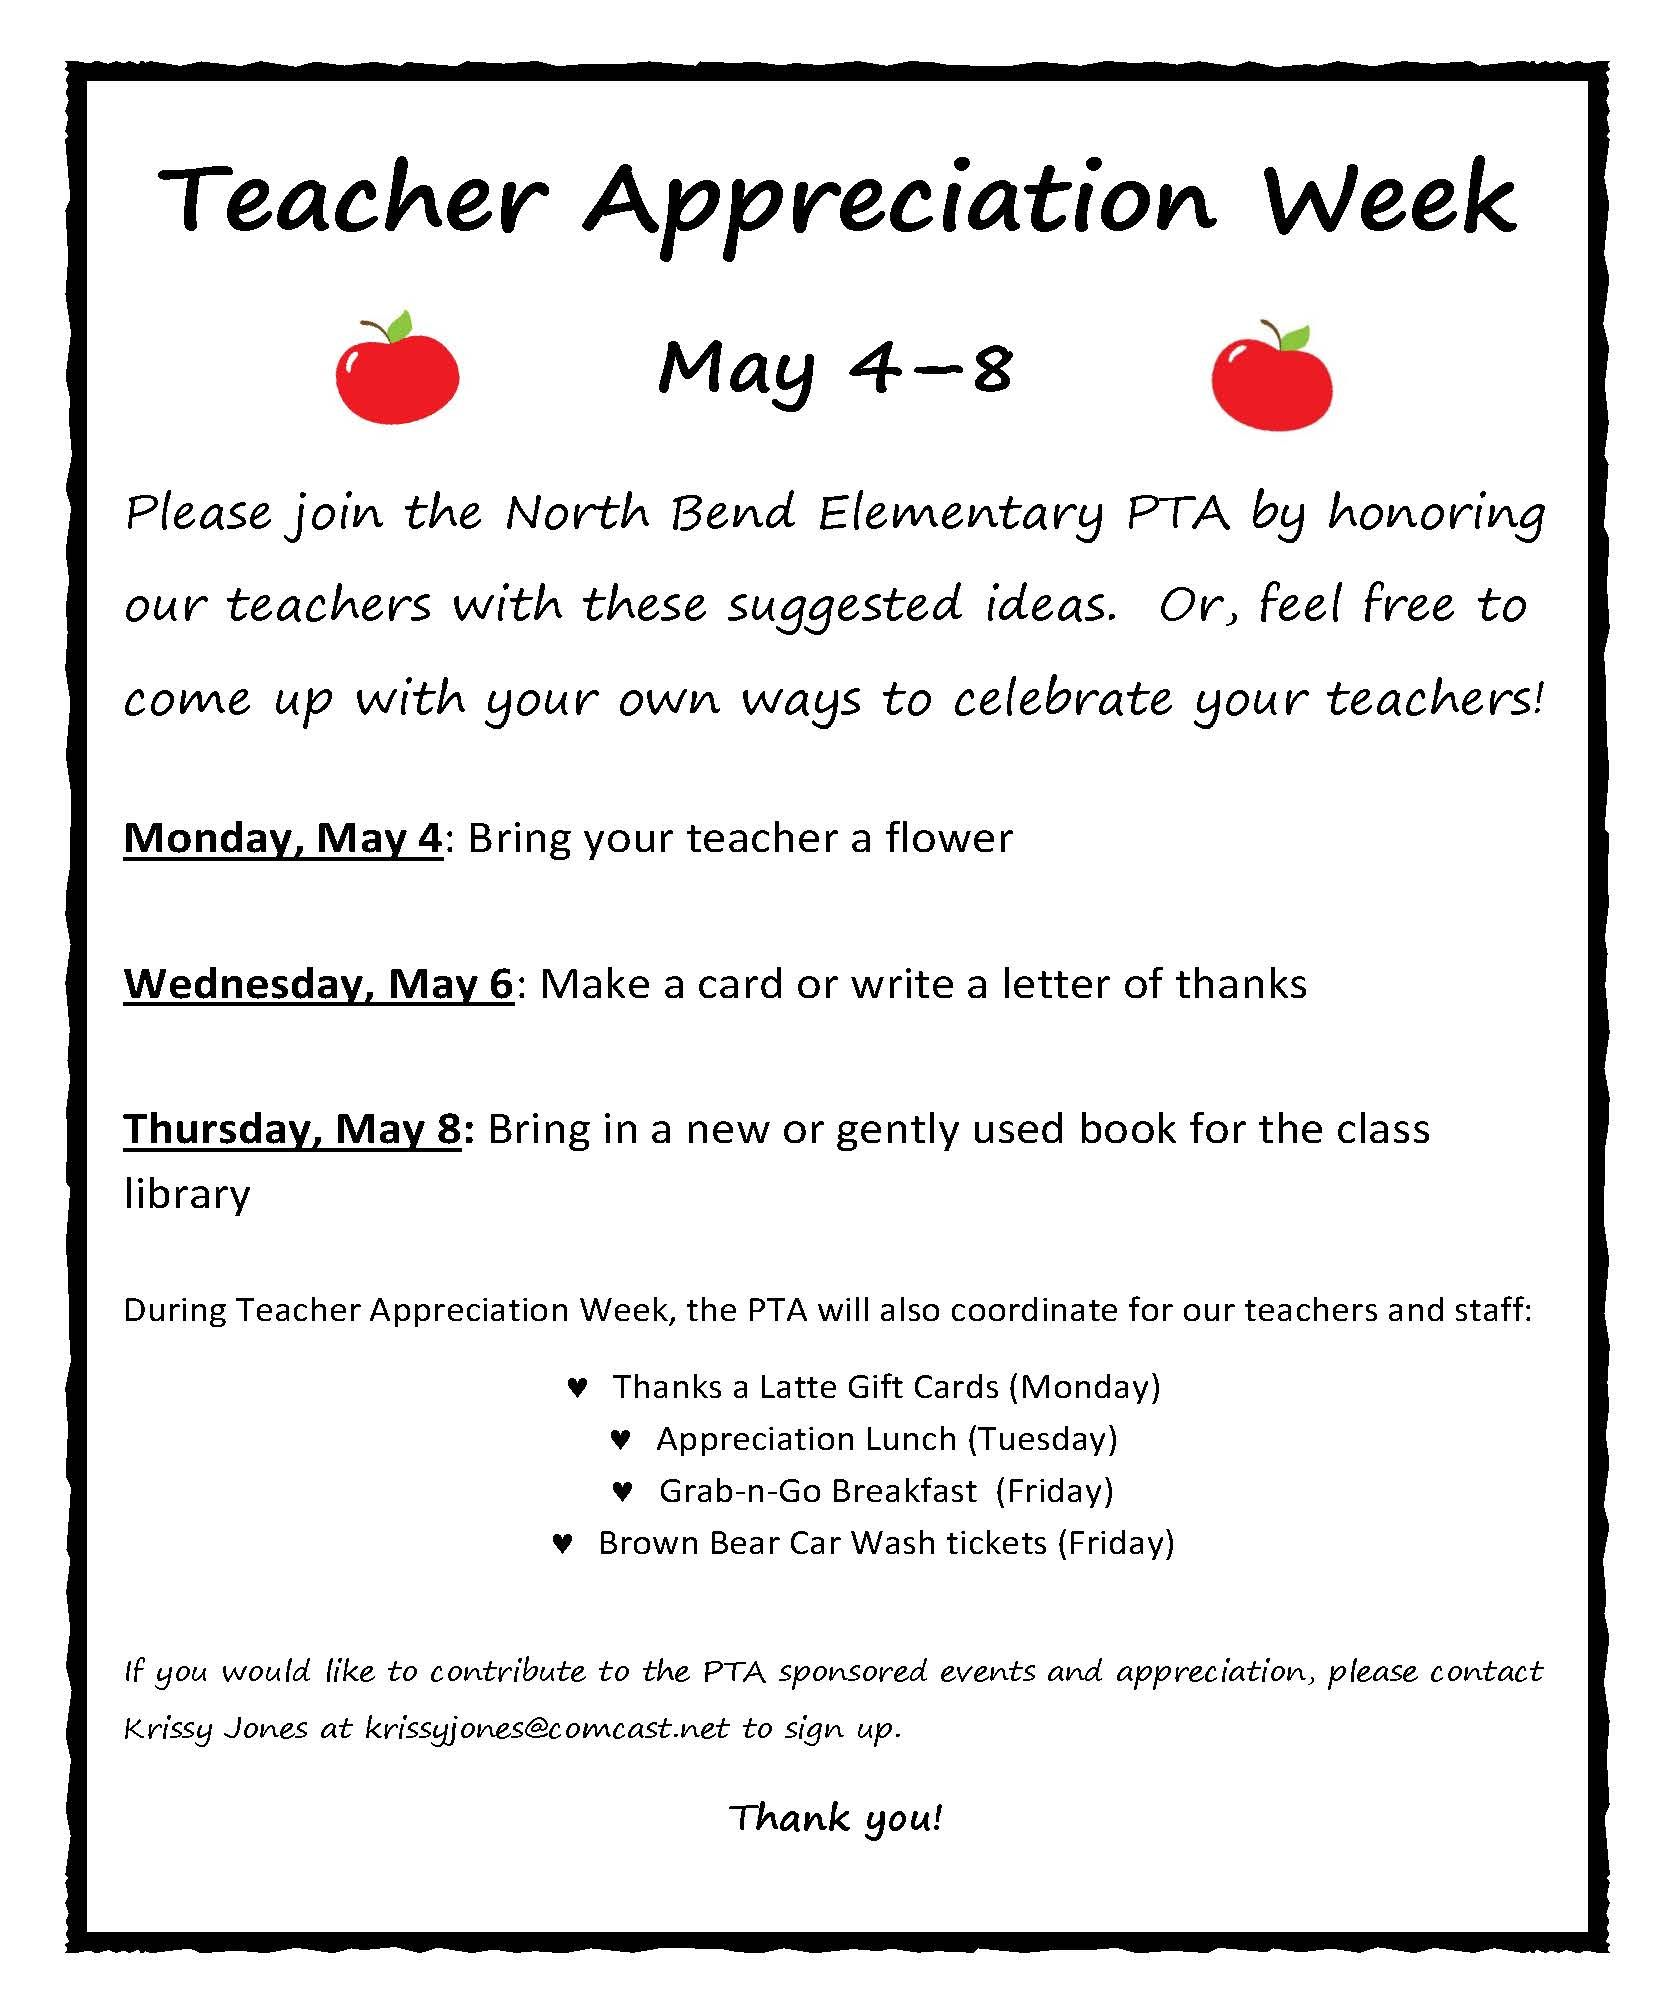 Teacher Appreciation Week Schedule Yahoo Image Search Results